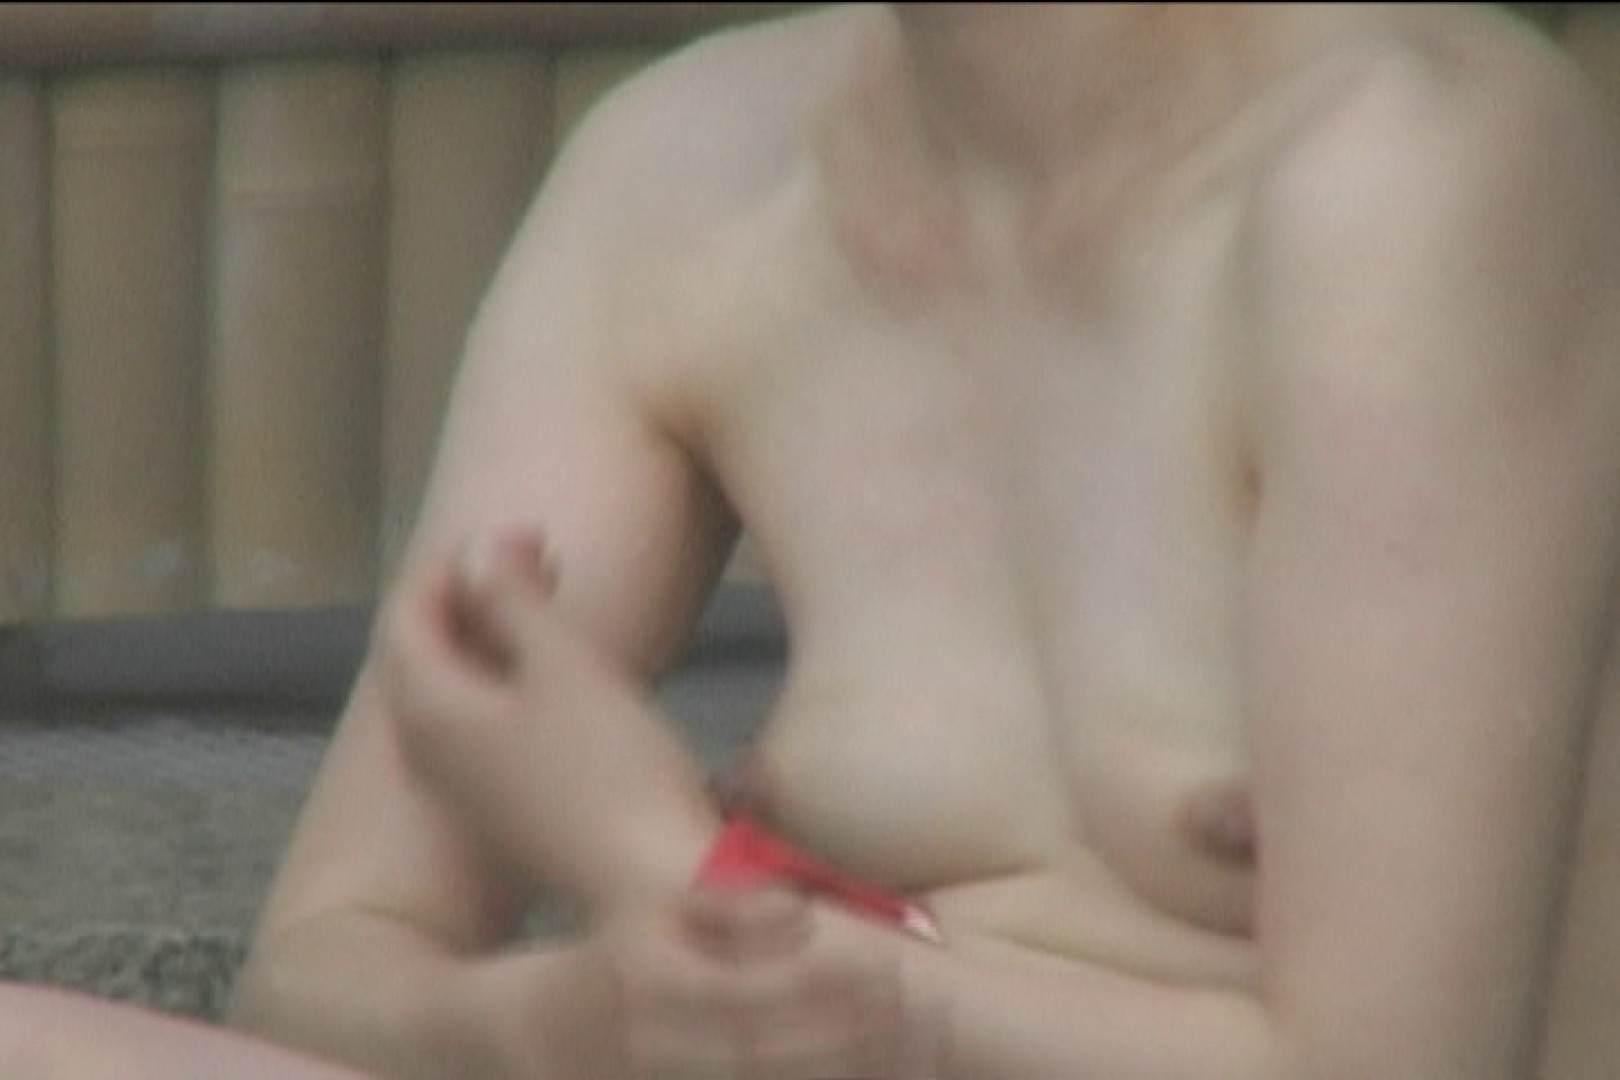 Aquaな露天風呂Vol.121 女体盗撮 隠し撮りAV無料 89連発 59